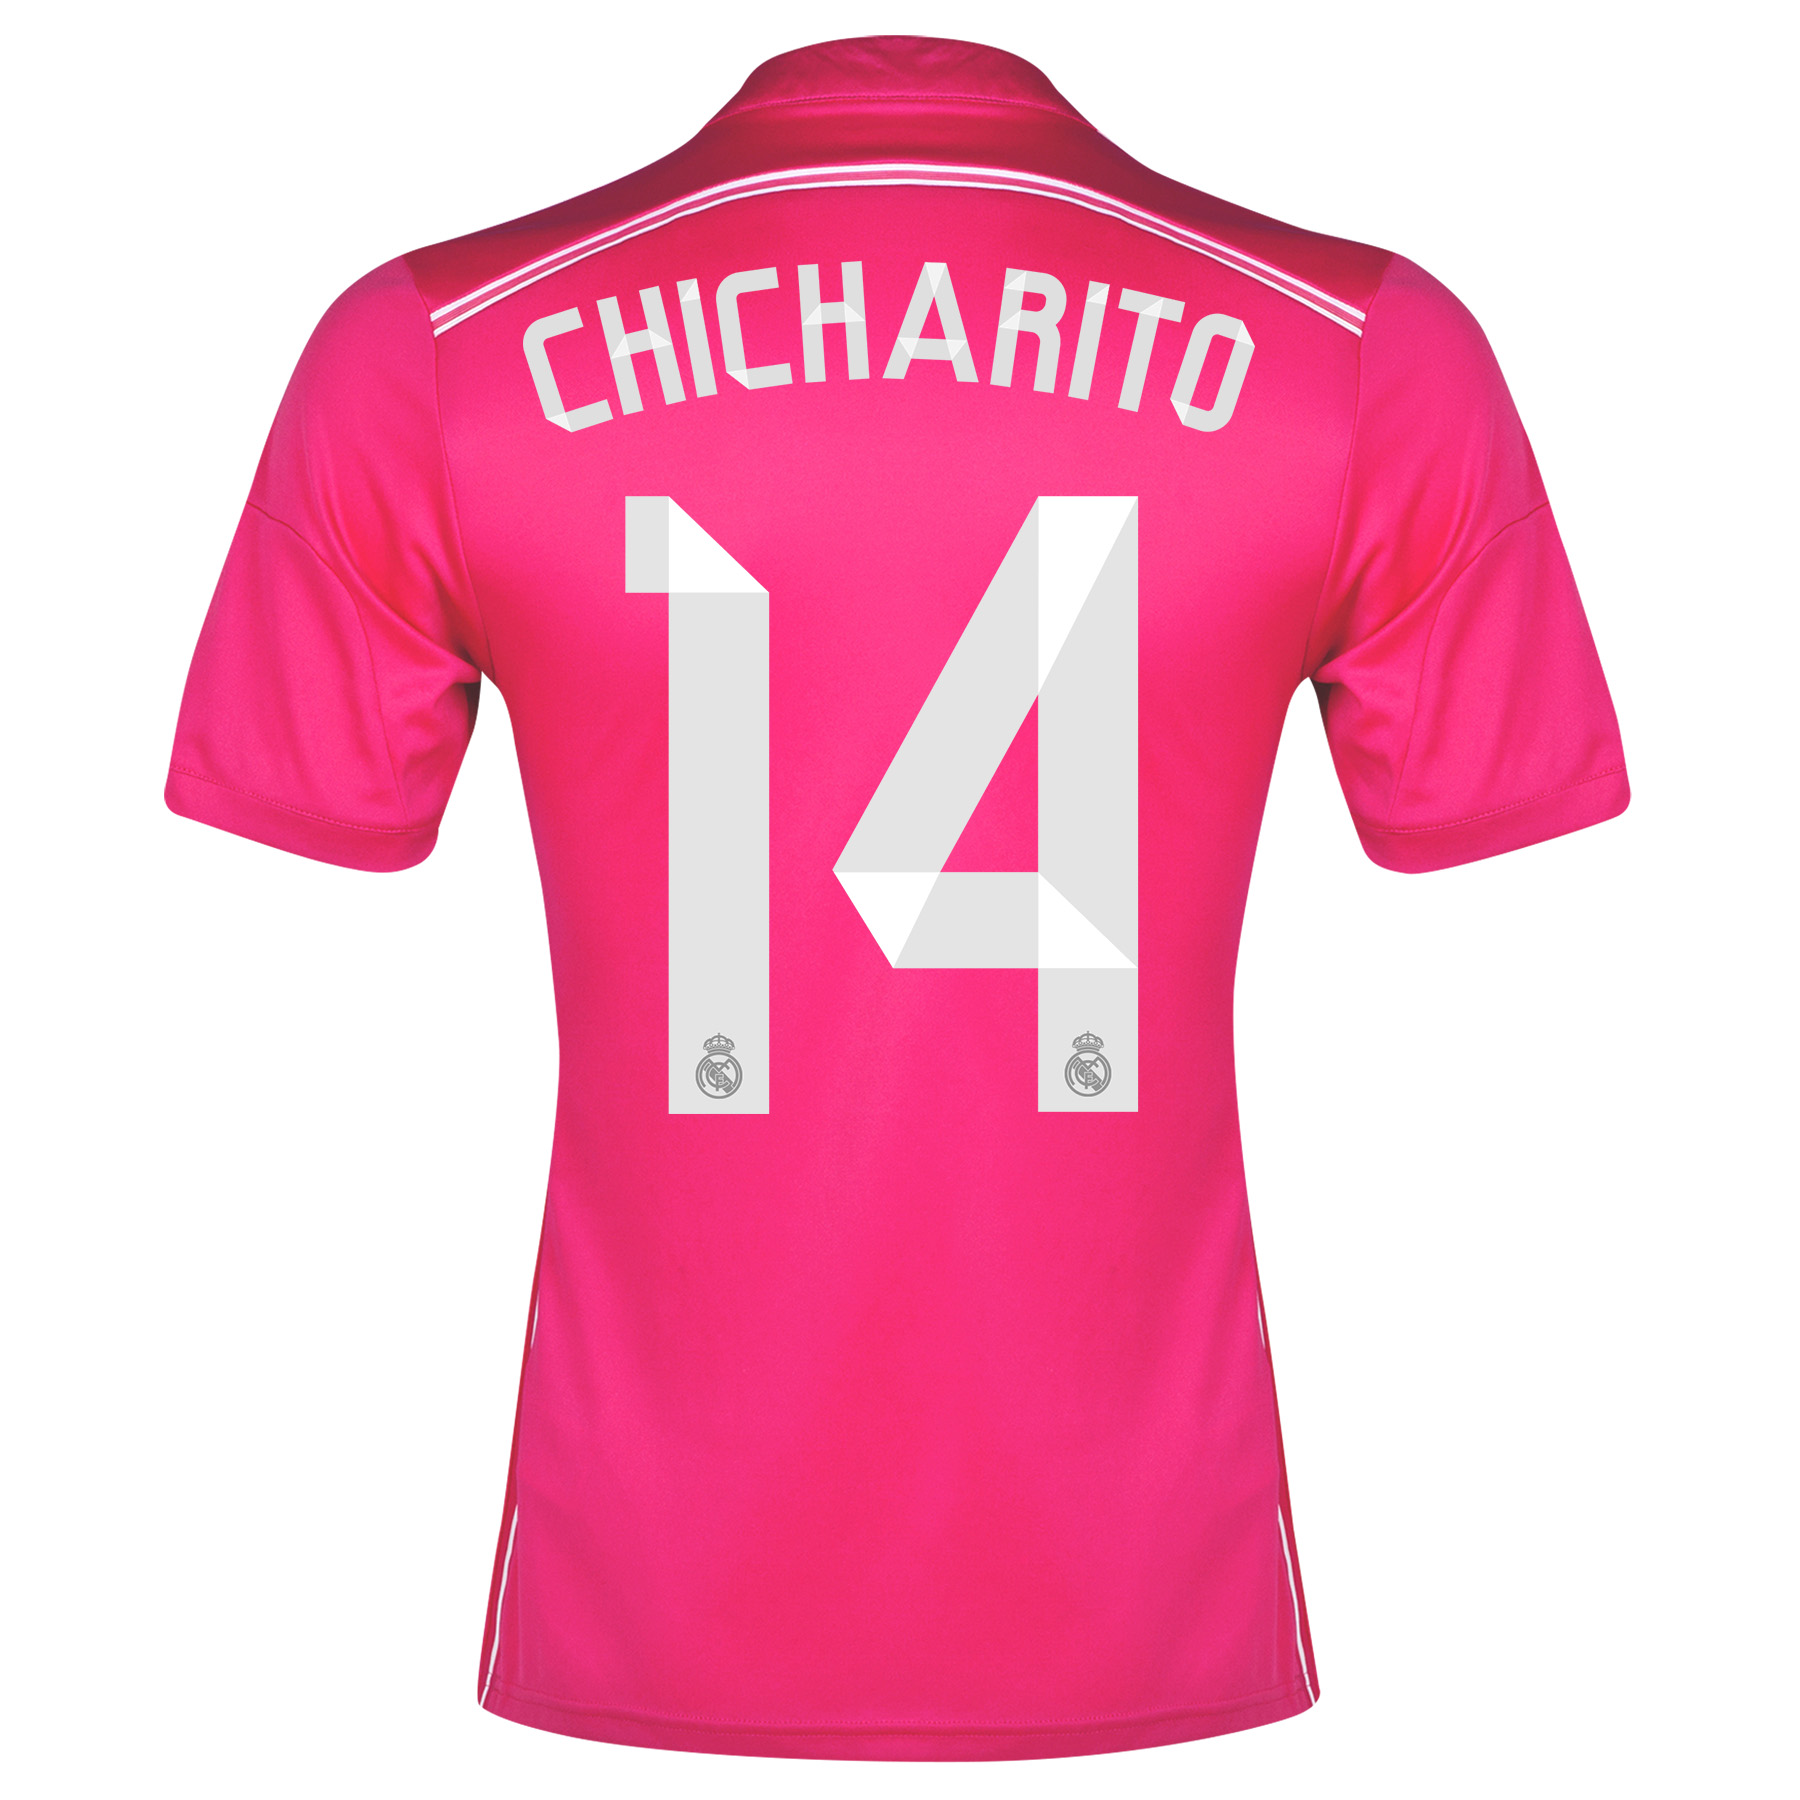 Real Madrid Away Shirt 2014/15 with Chicharito 14 printing